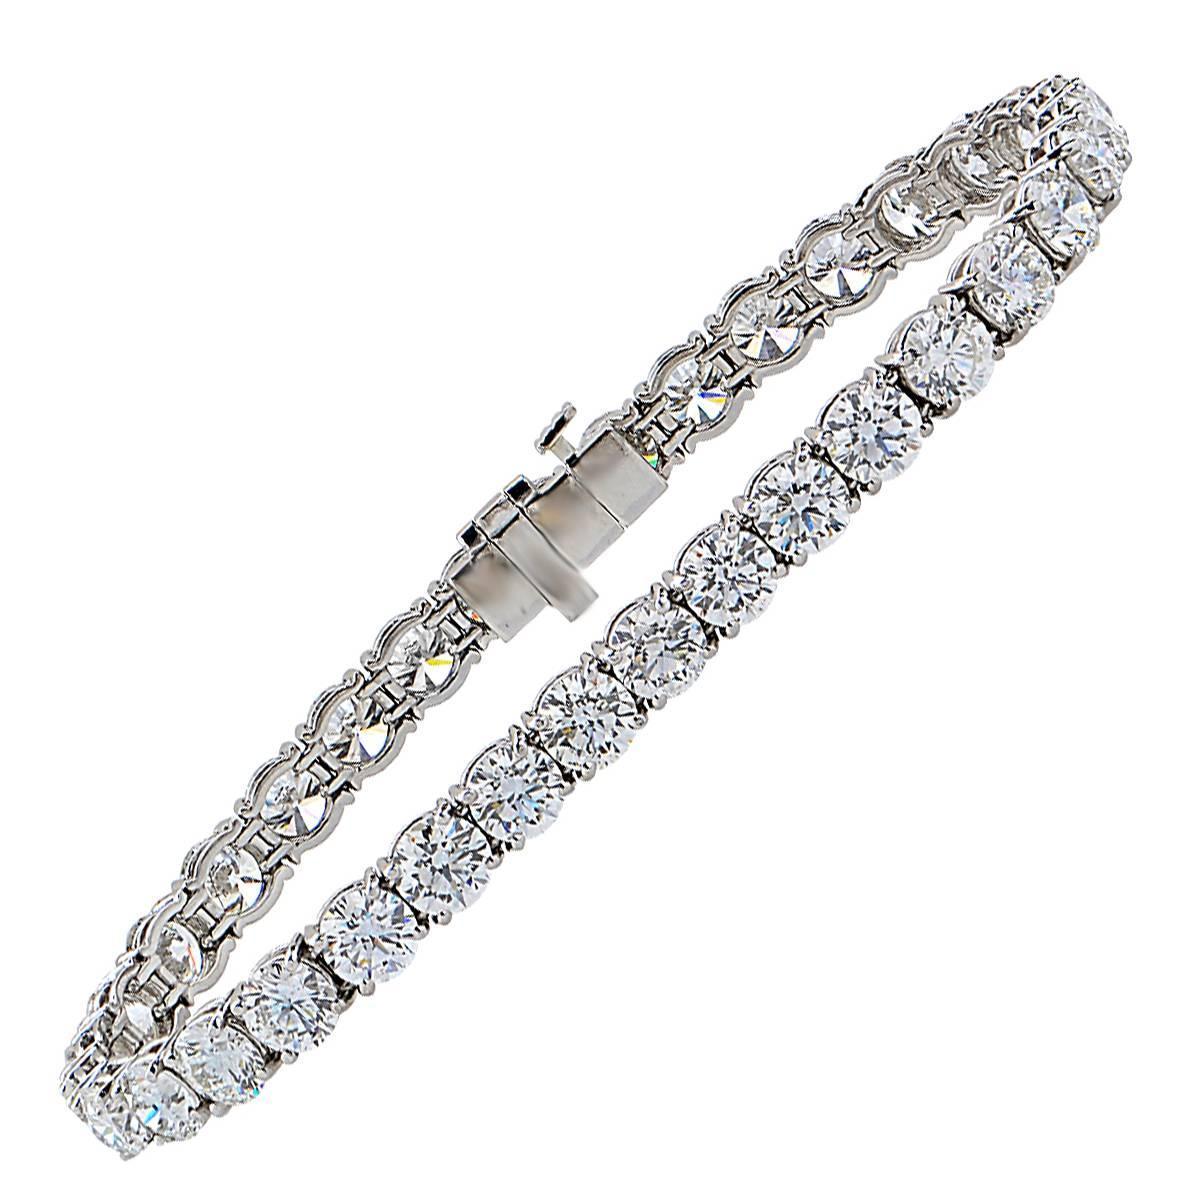 Diamond Platinum Tennis Bracelet For Sale At 1stdibs